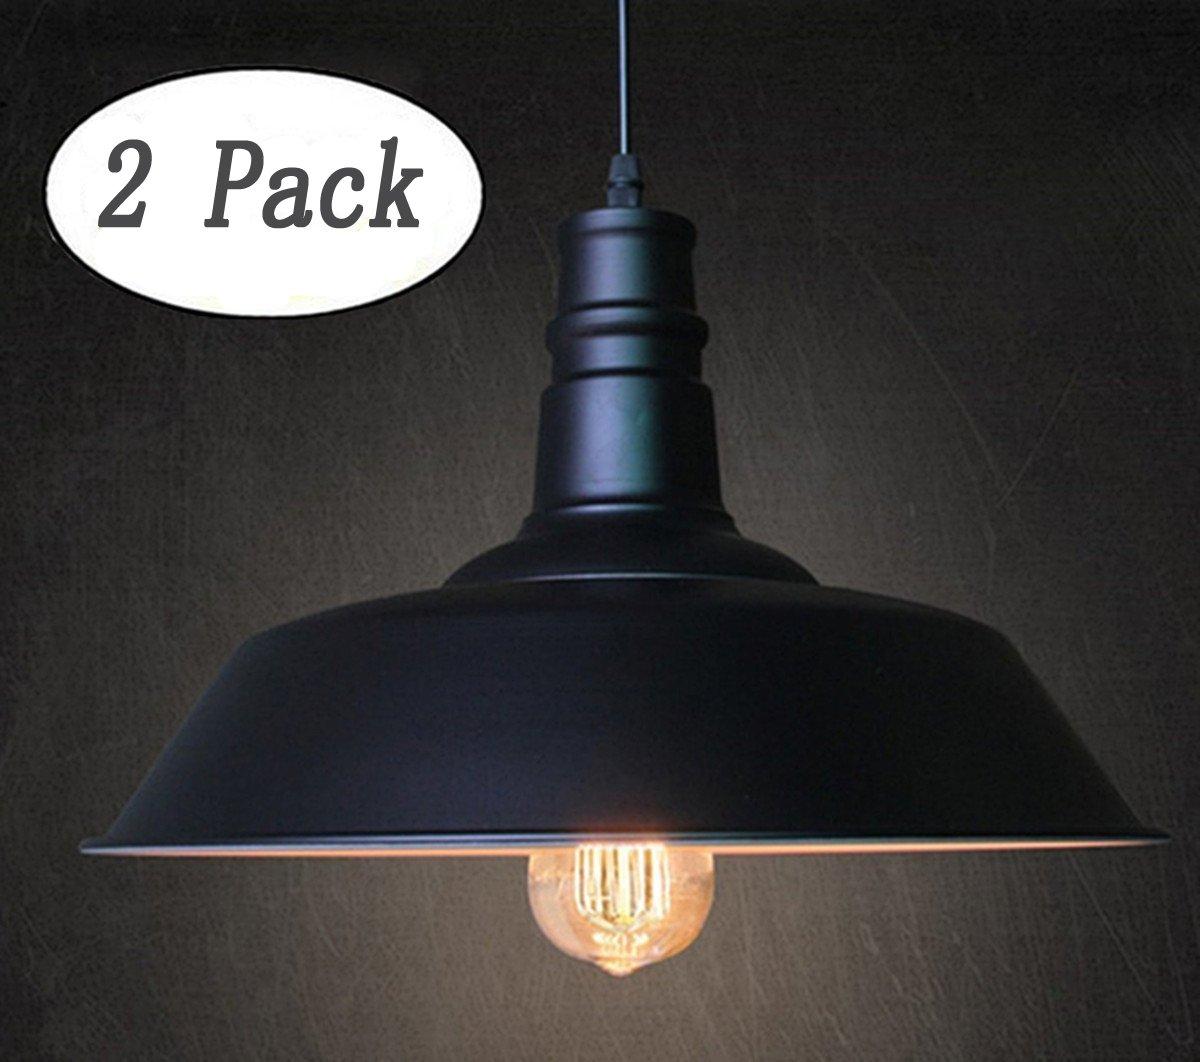 FadimiKoo Industrial Pendant Lighting, E26 E27 Base Vintage Metal Hanging Light Edison Simplicity Lamp Fixturem 2 Pack by FadimiKoo